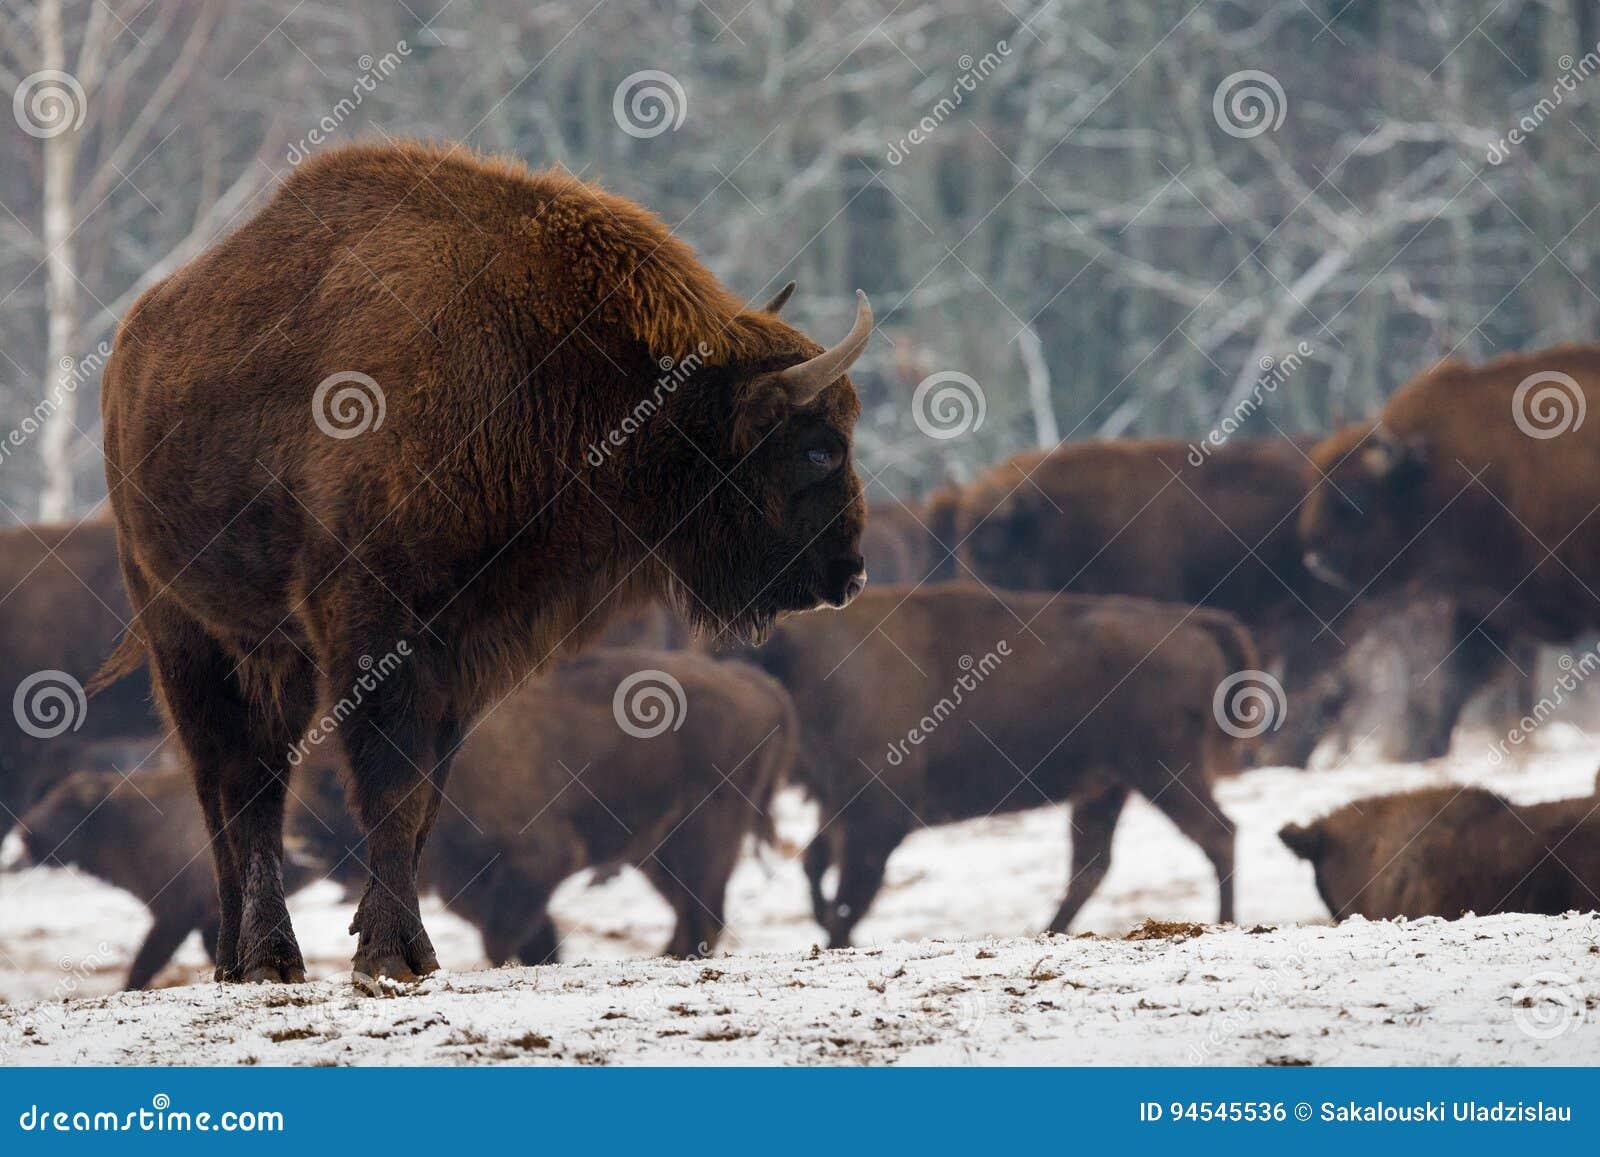 Stående av europén Bison Aurochs In Wild Nature Kraftig vuxen europé Bison Close-Up On The Background av flocken i vinter